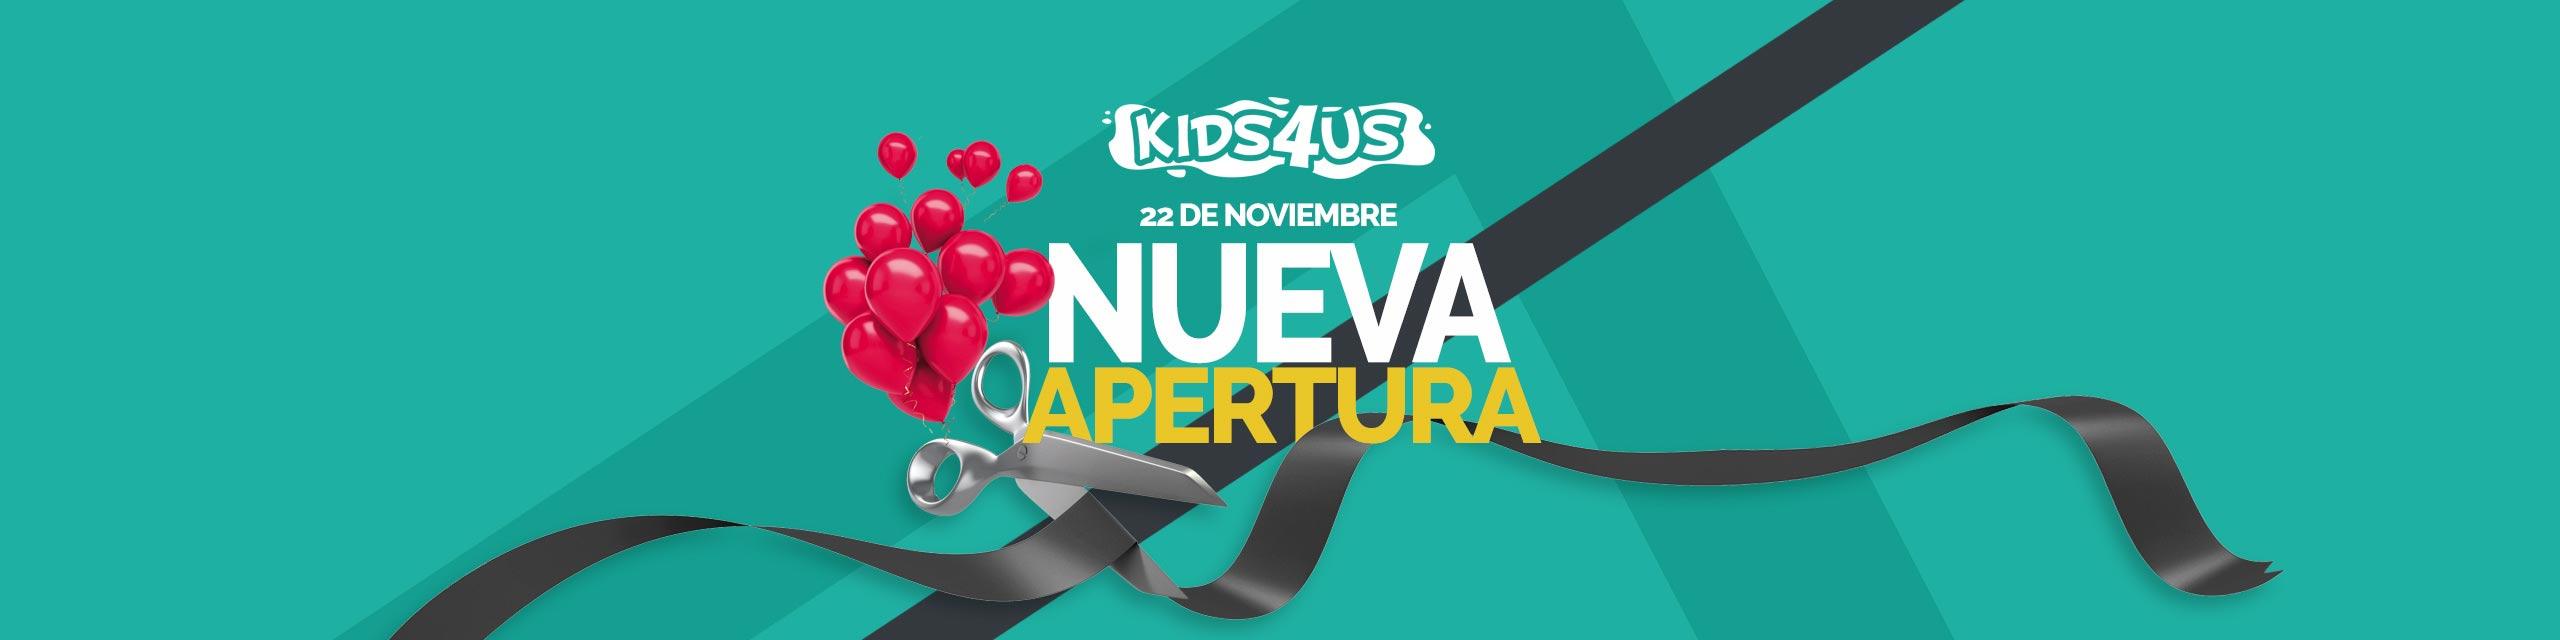 Slider Apertura kids4us